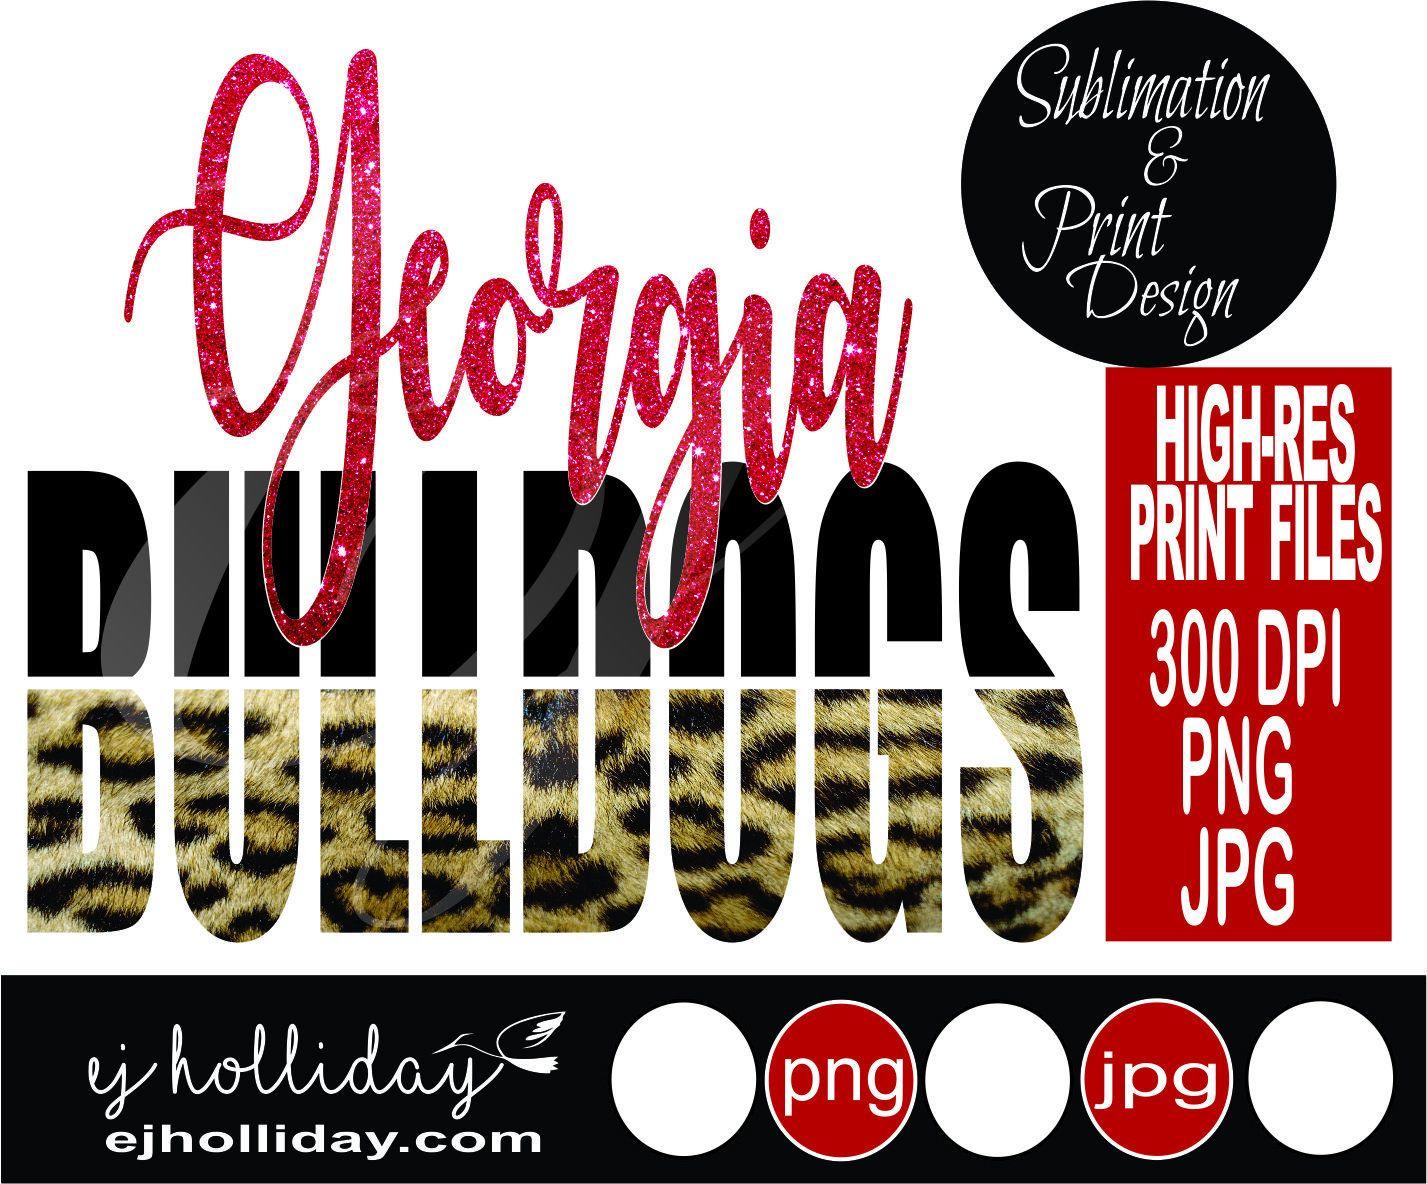 Bulldogs Leopard Print 19 Digital Print Design PNG